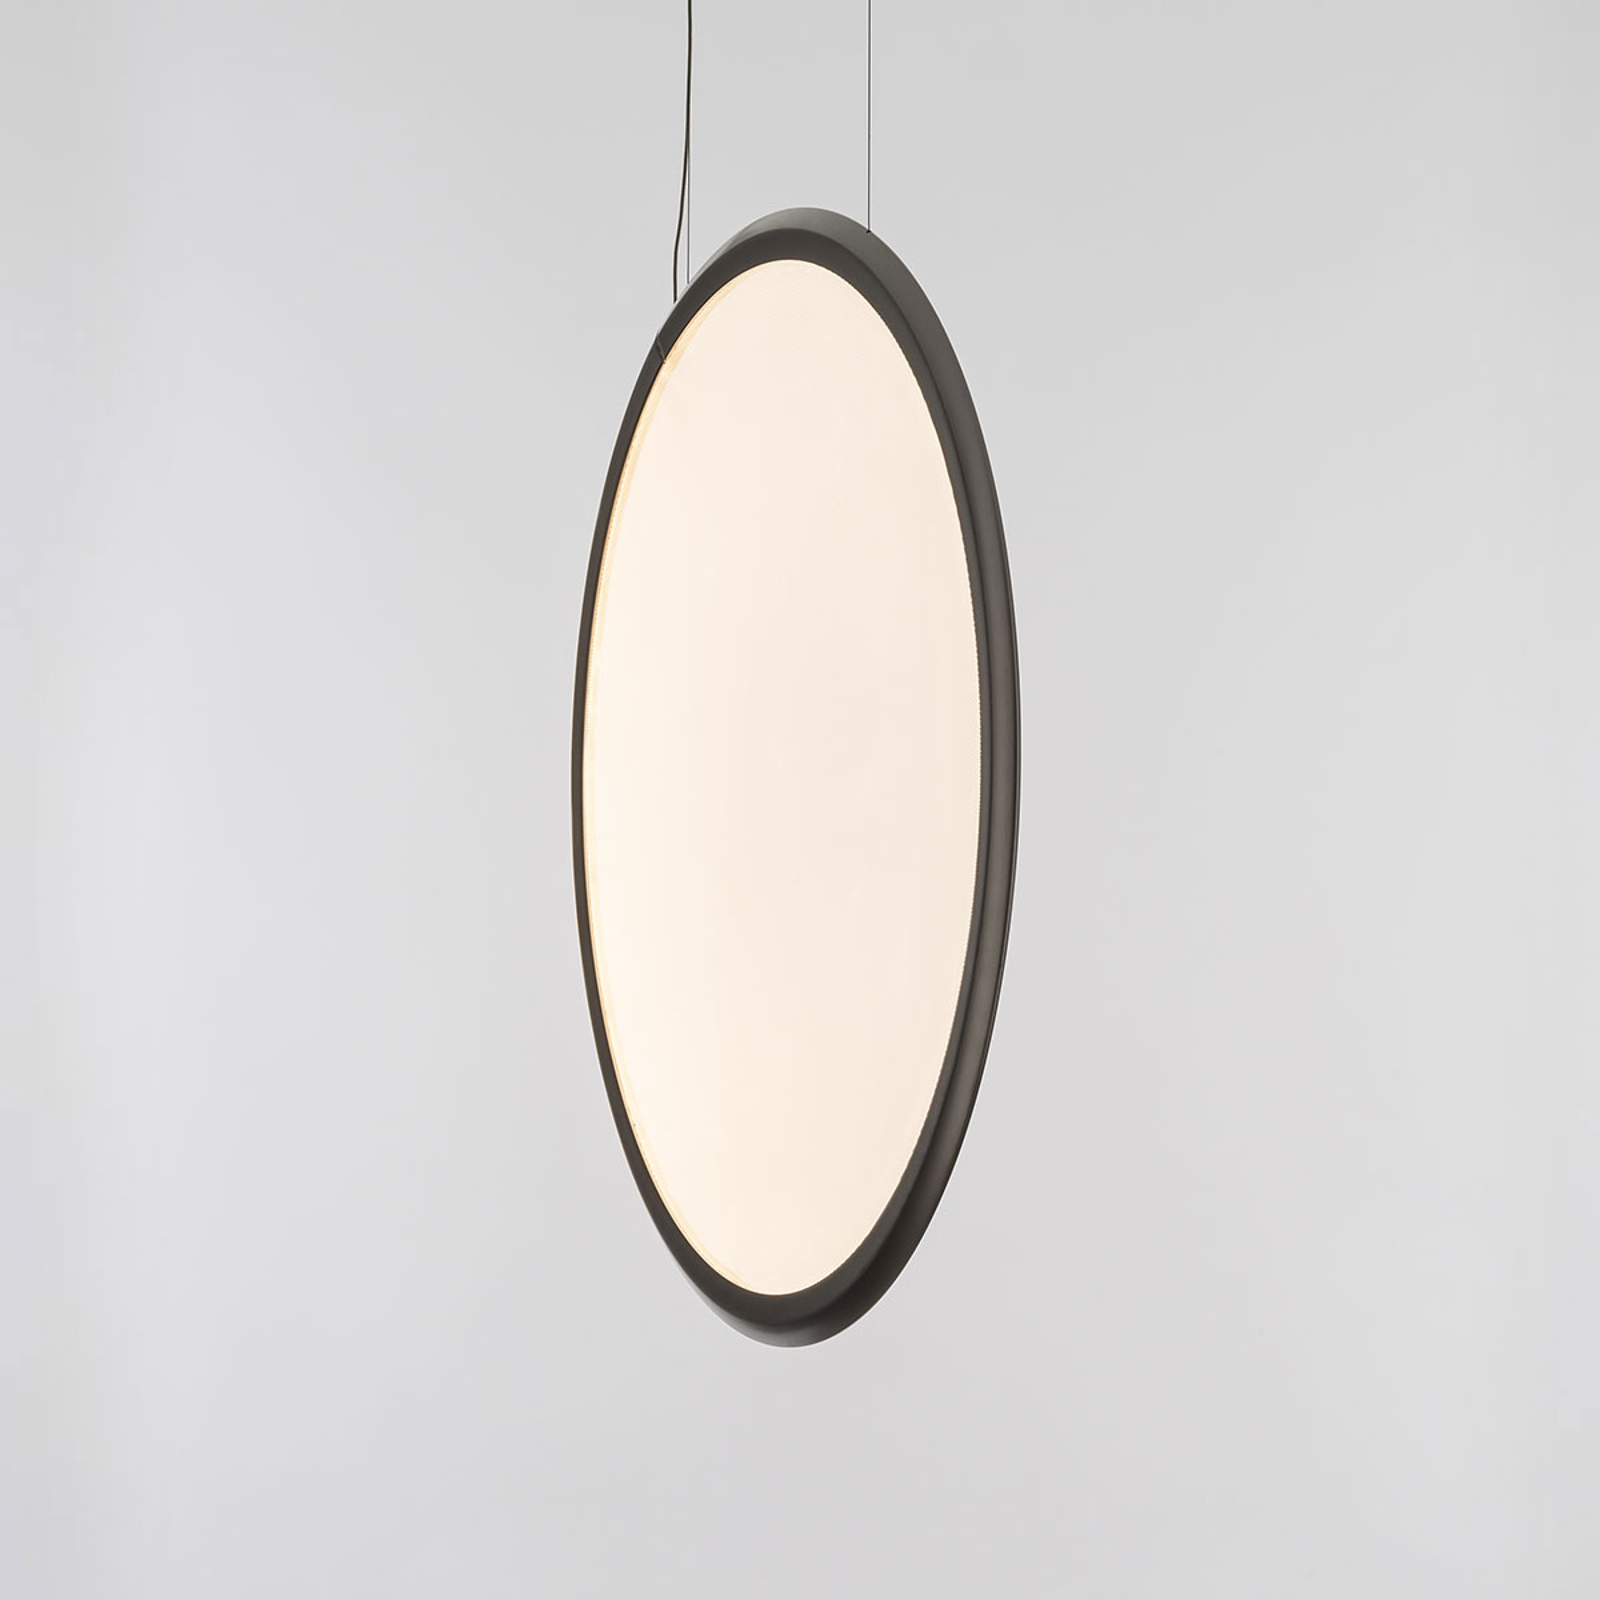 Artemide Discovery Vertical LED hanglamp 70 cm